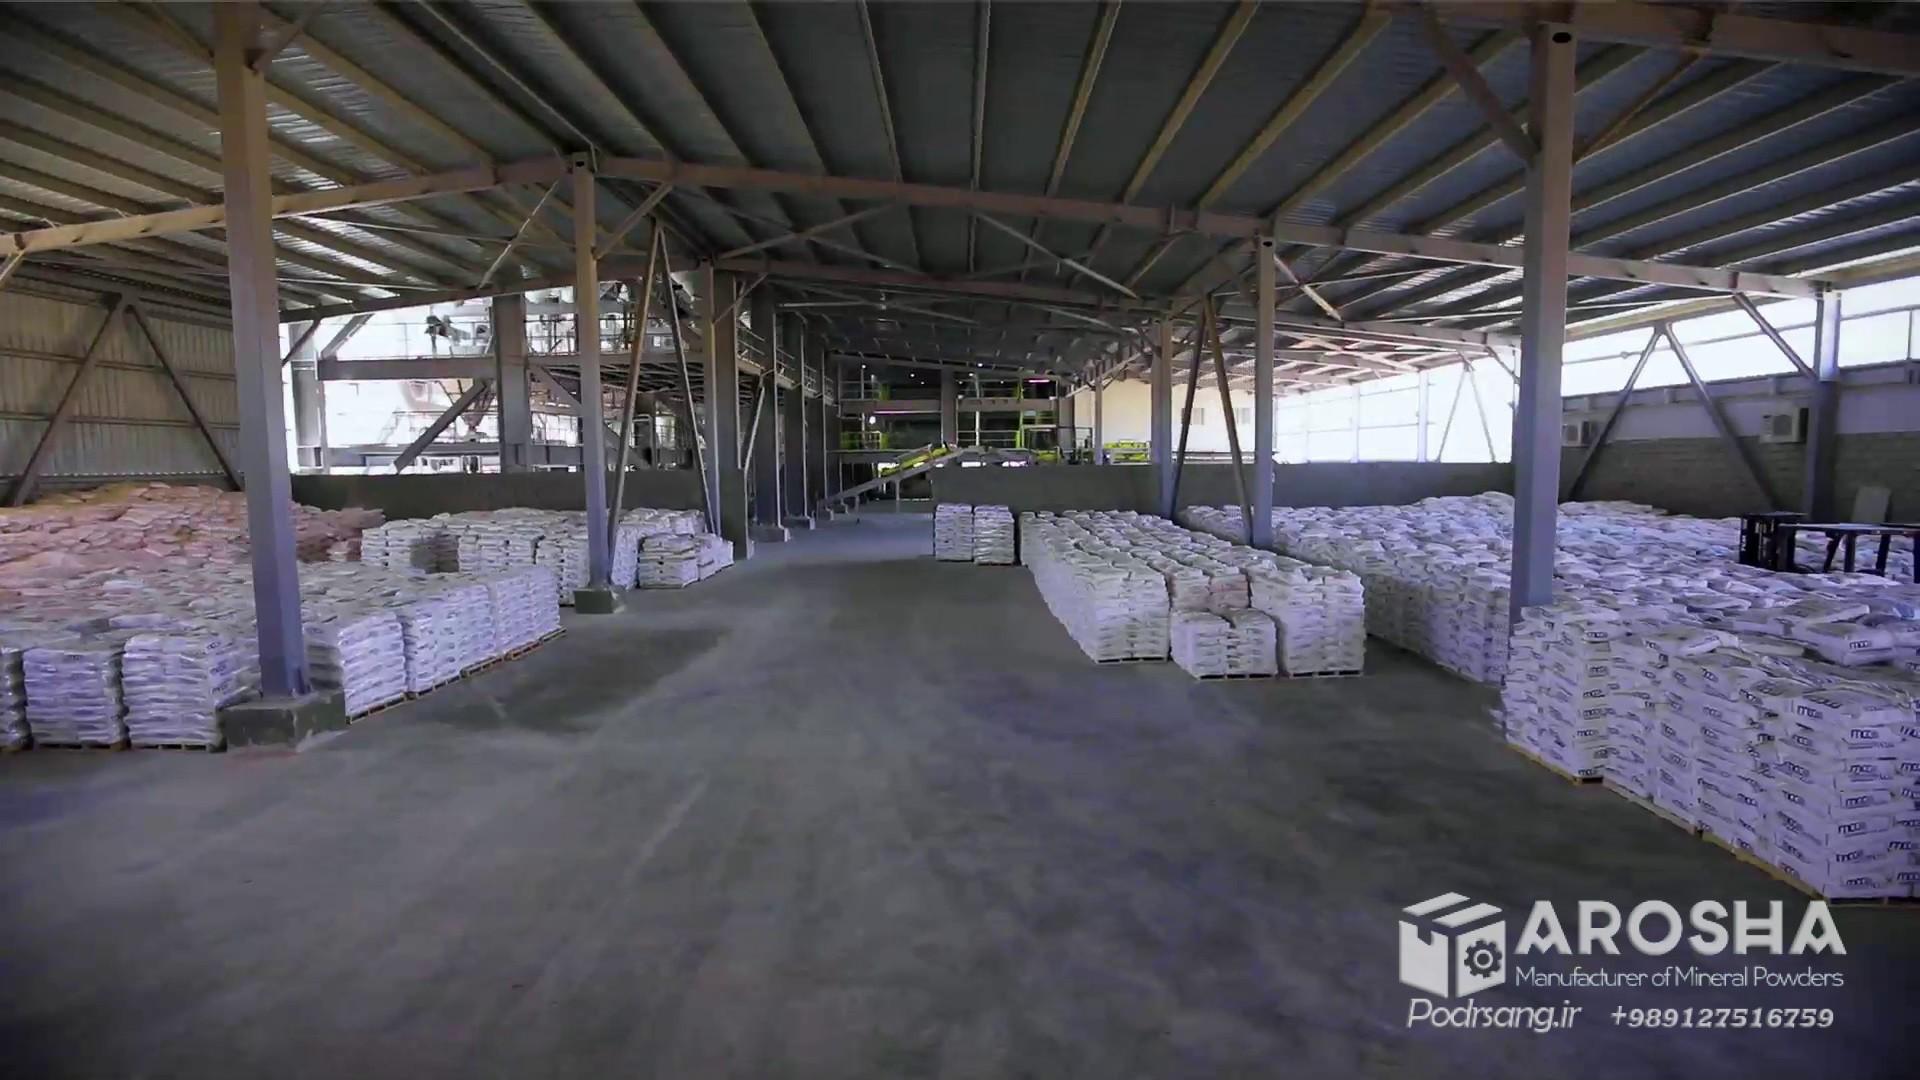 خرید کربنات کلسیم از کارخانه قم